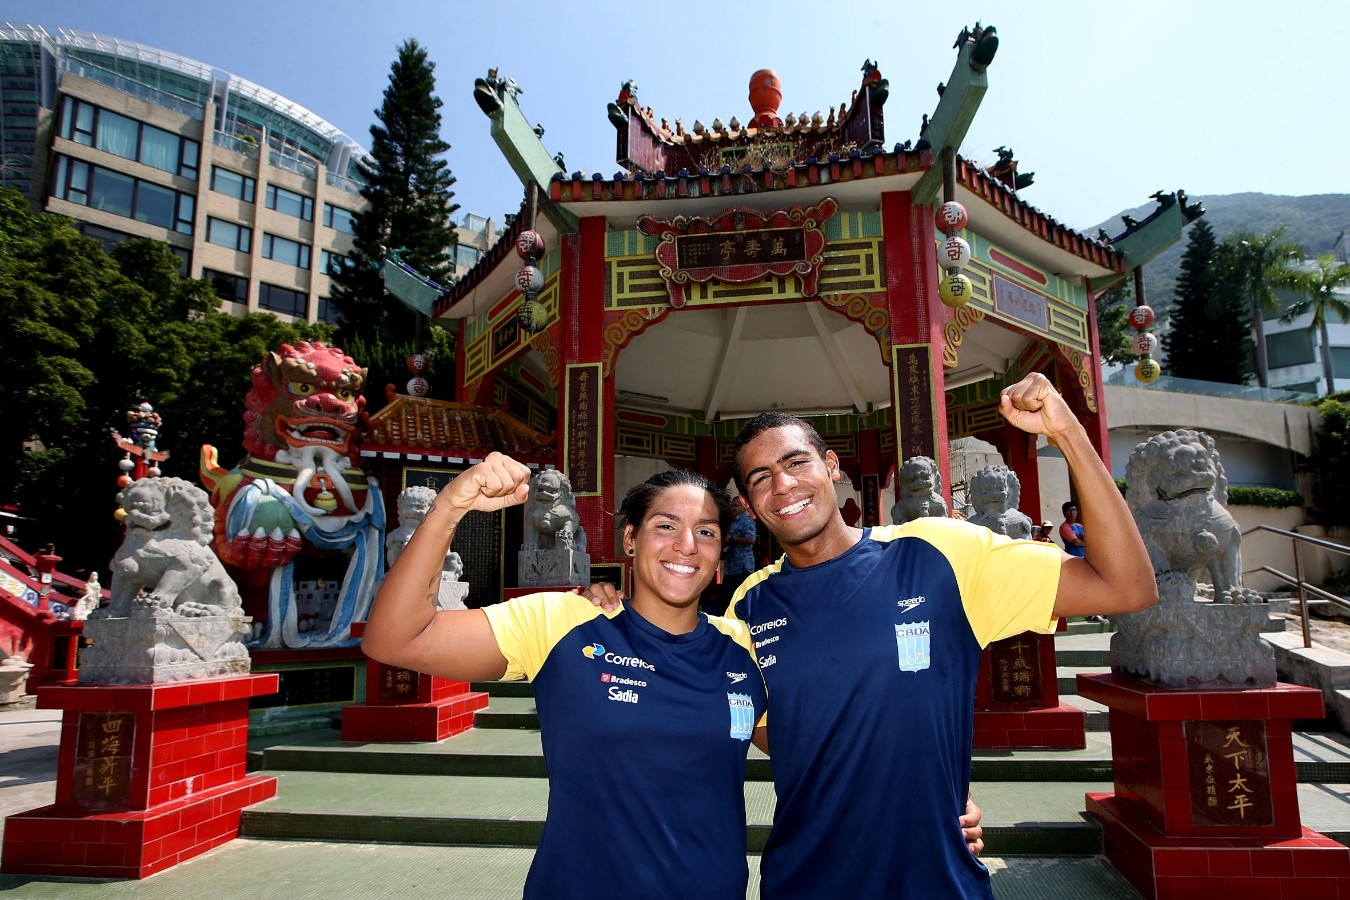 Ana Marcela, Allan do Carmo. Copa do Mundo de Maratonas Aquaticas, etapa Travessia de Hong Kong na Repulse Bay . 18 de Outubro de 2014, Hong Kong. Foto: Satiro Sodre/SSPress.